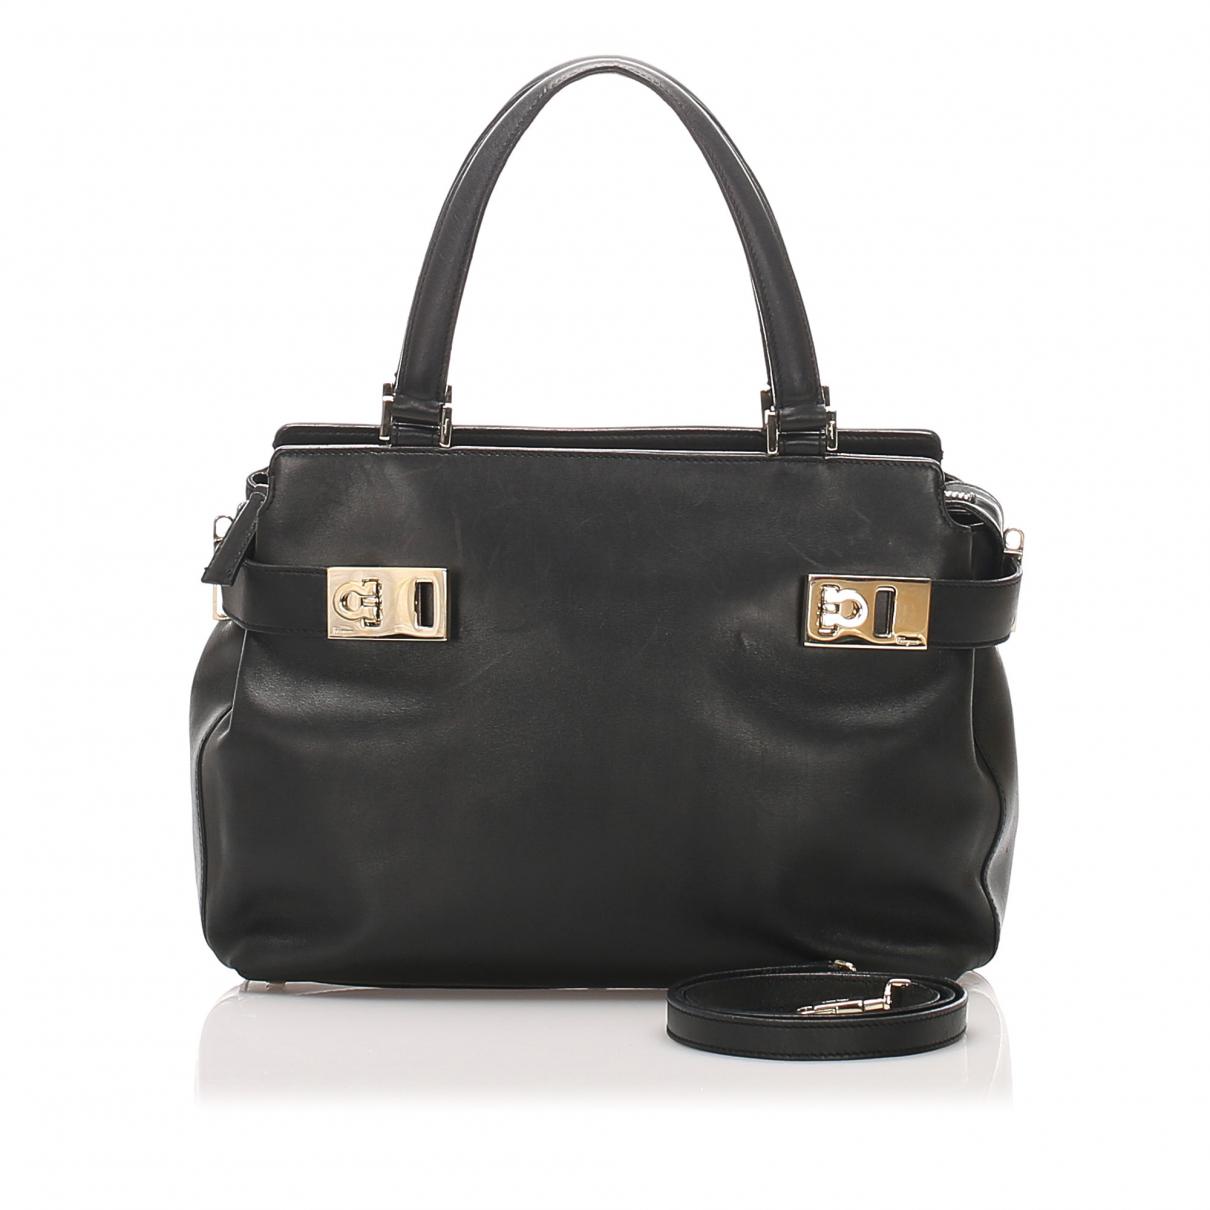 Salvatore Ferragamo \N Black Leather handbag for Women \N